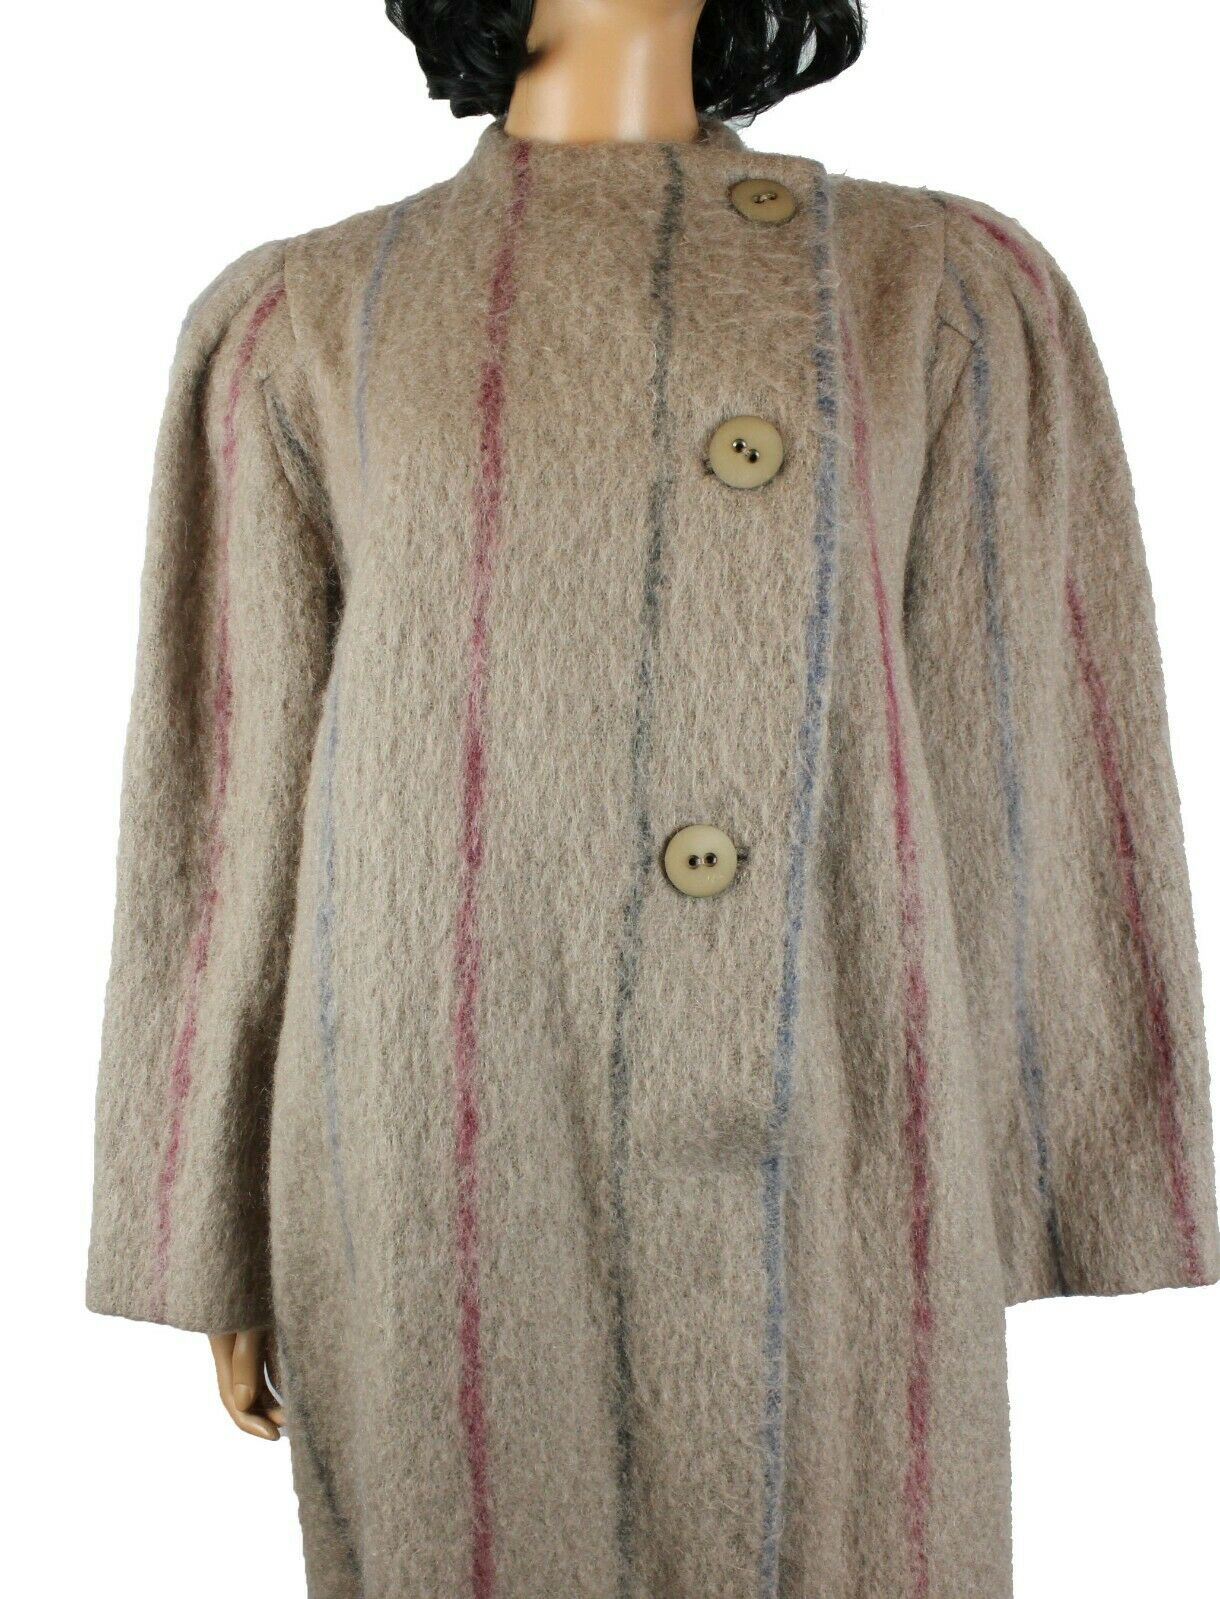 Designer Coat Sz 8 M Vintage 80s Pauline Trigere … - image 3